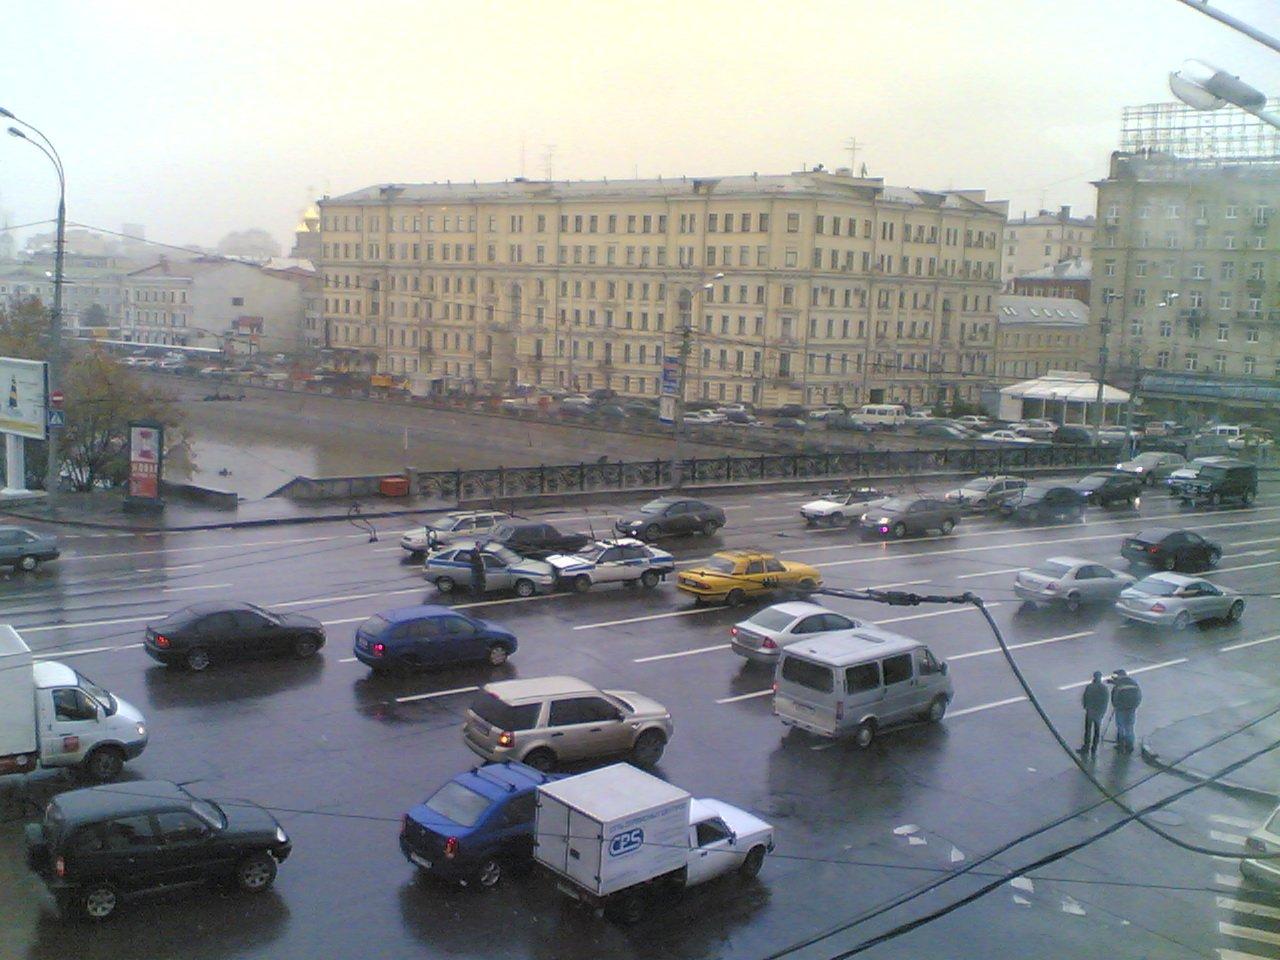 http://www.ljplus.ru/img4/l/e/leteha/idio.jpg